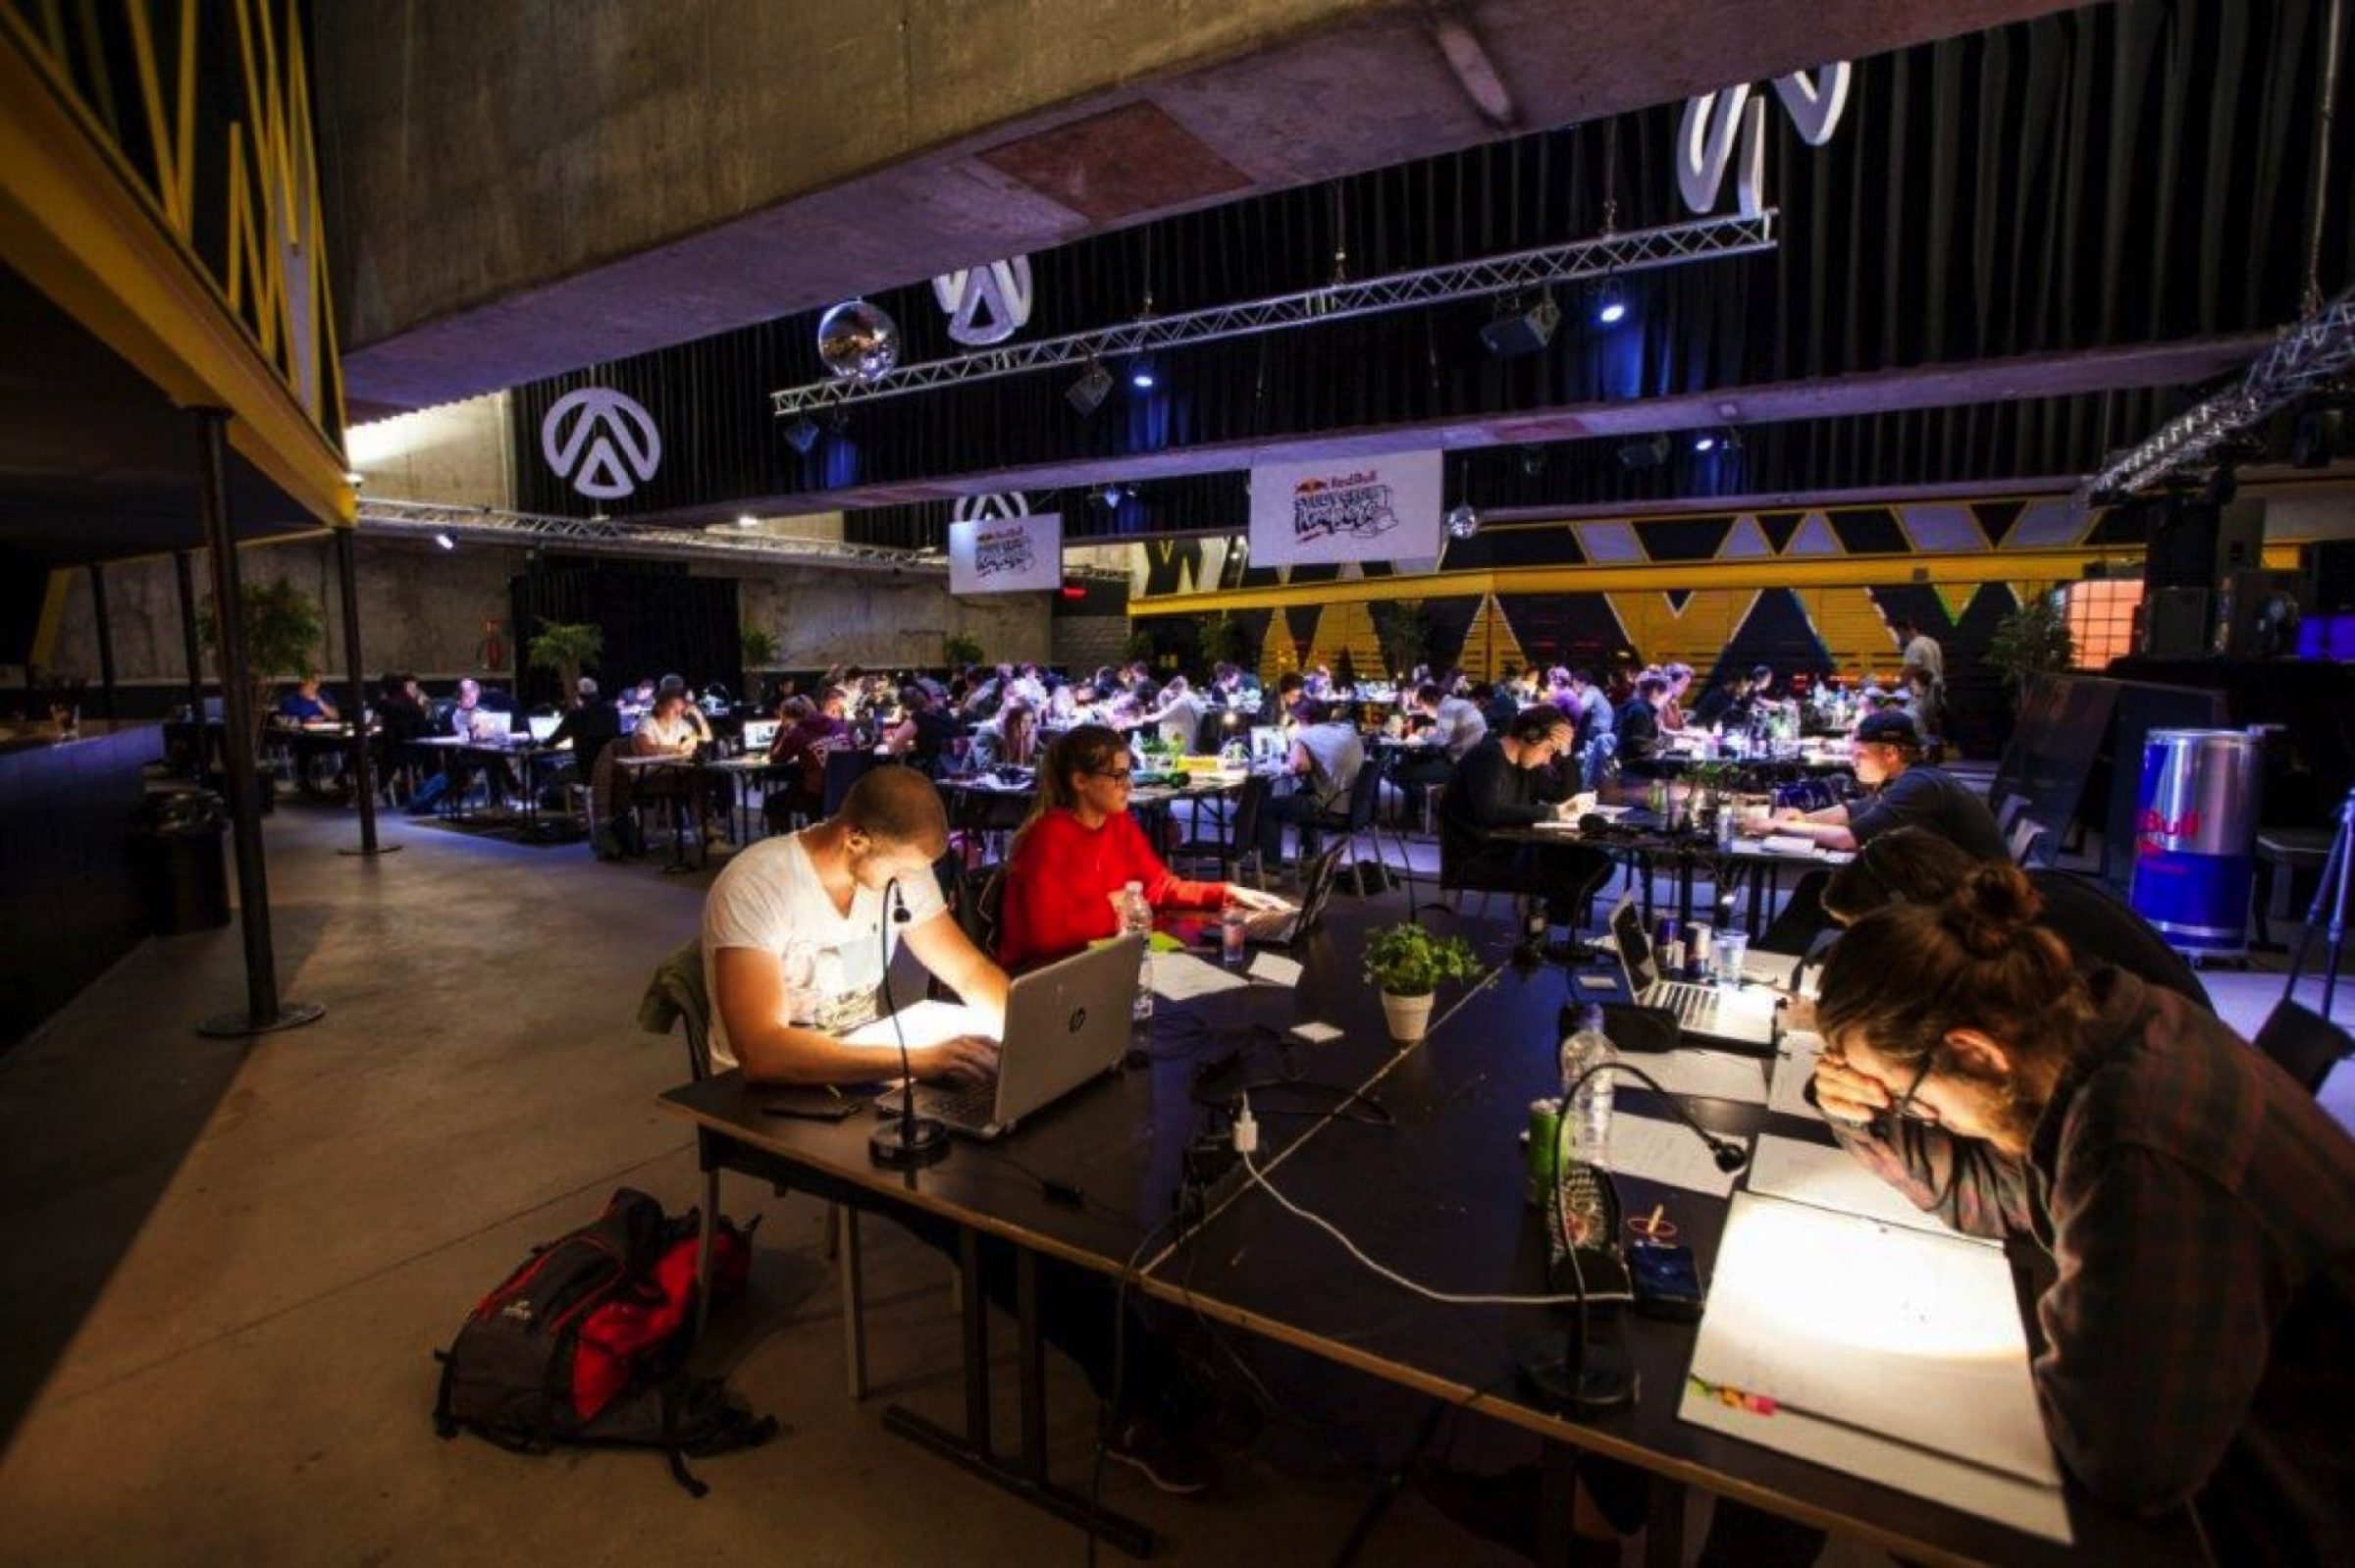 Fast Forward Evenementenbureau Gent Publiek Event Redbull Studyclub 3